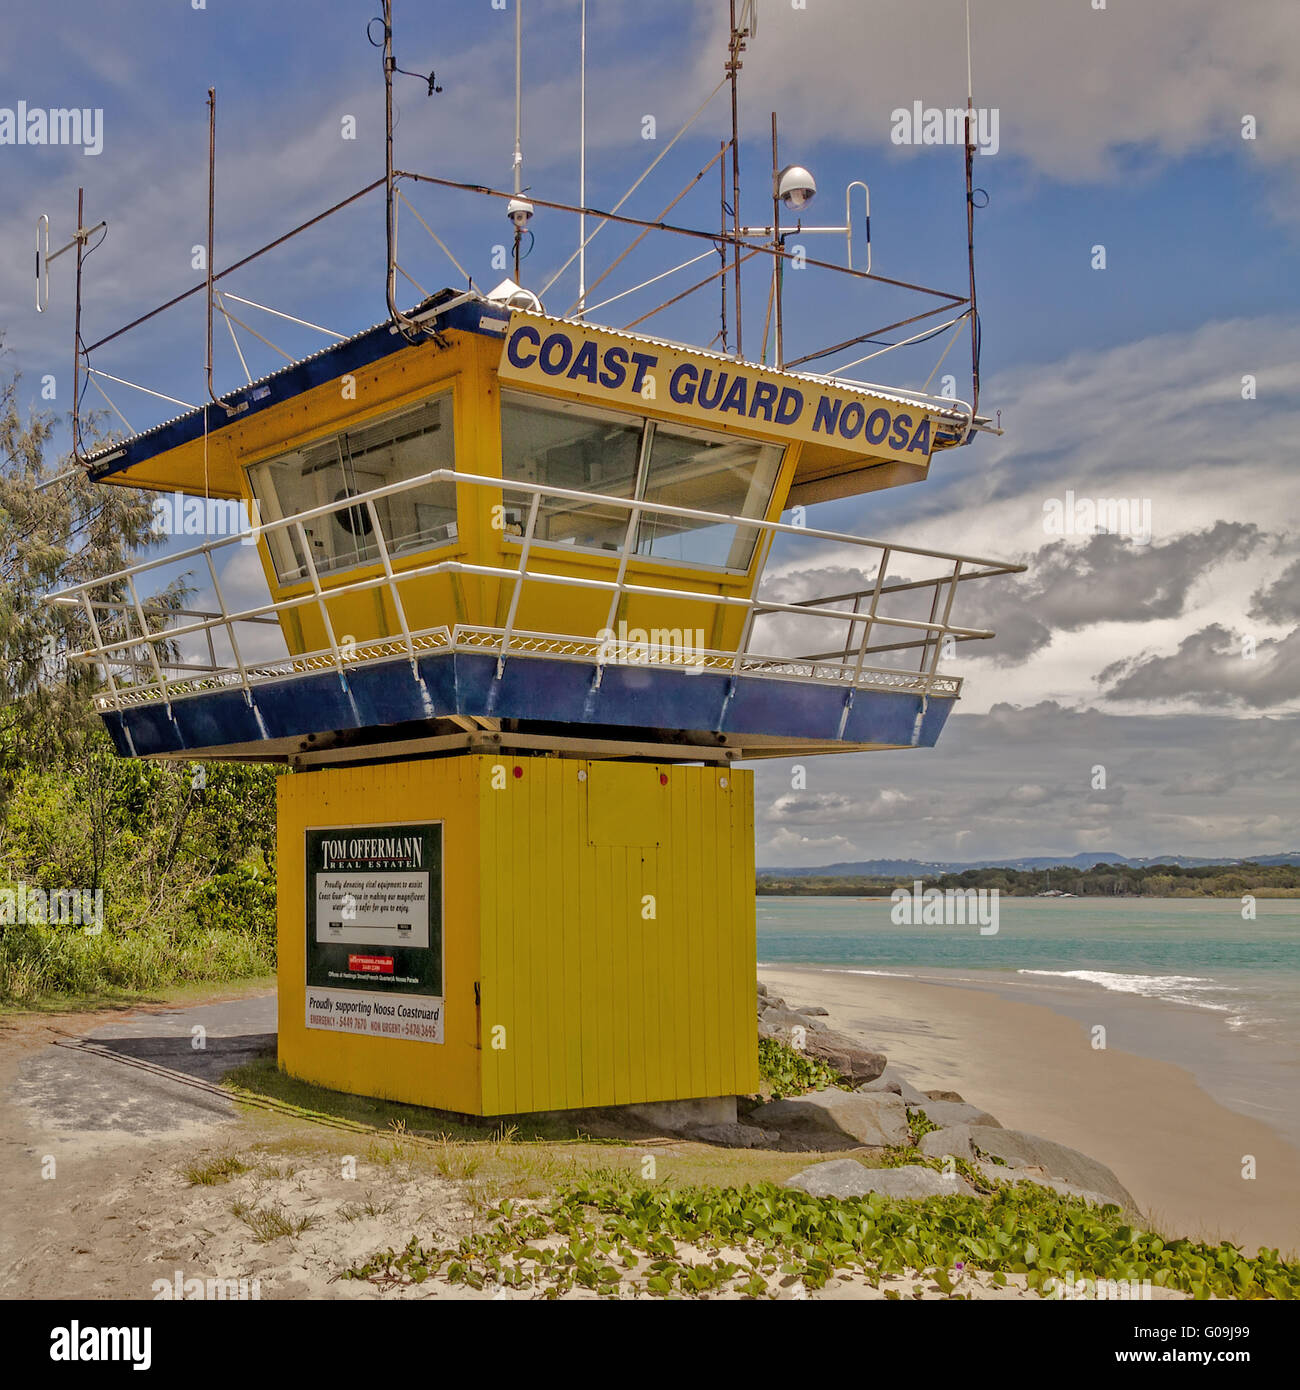 Coast Guard Station Noosa Queensland Australia - Stock Image